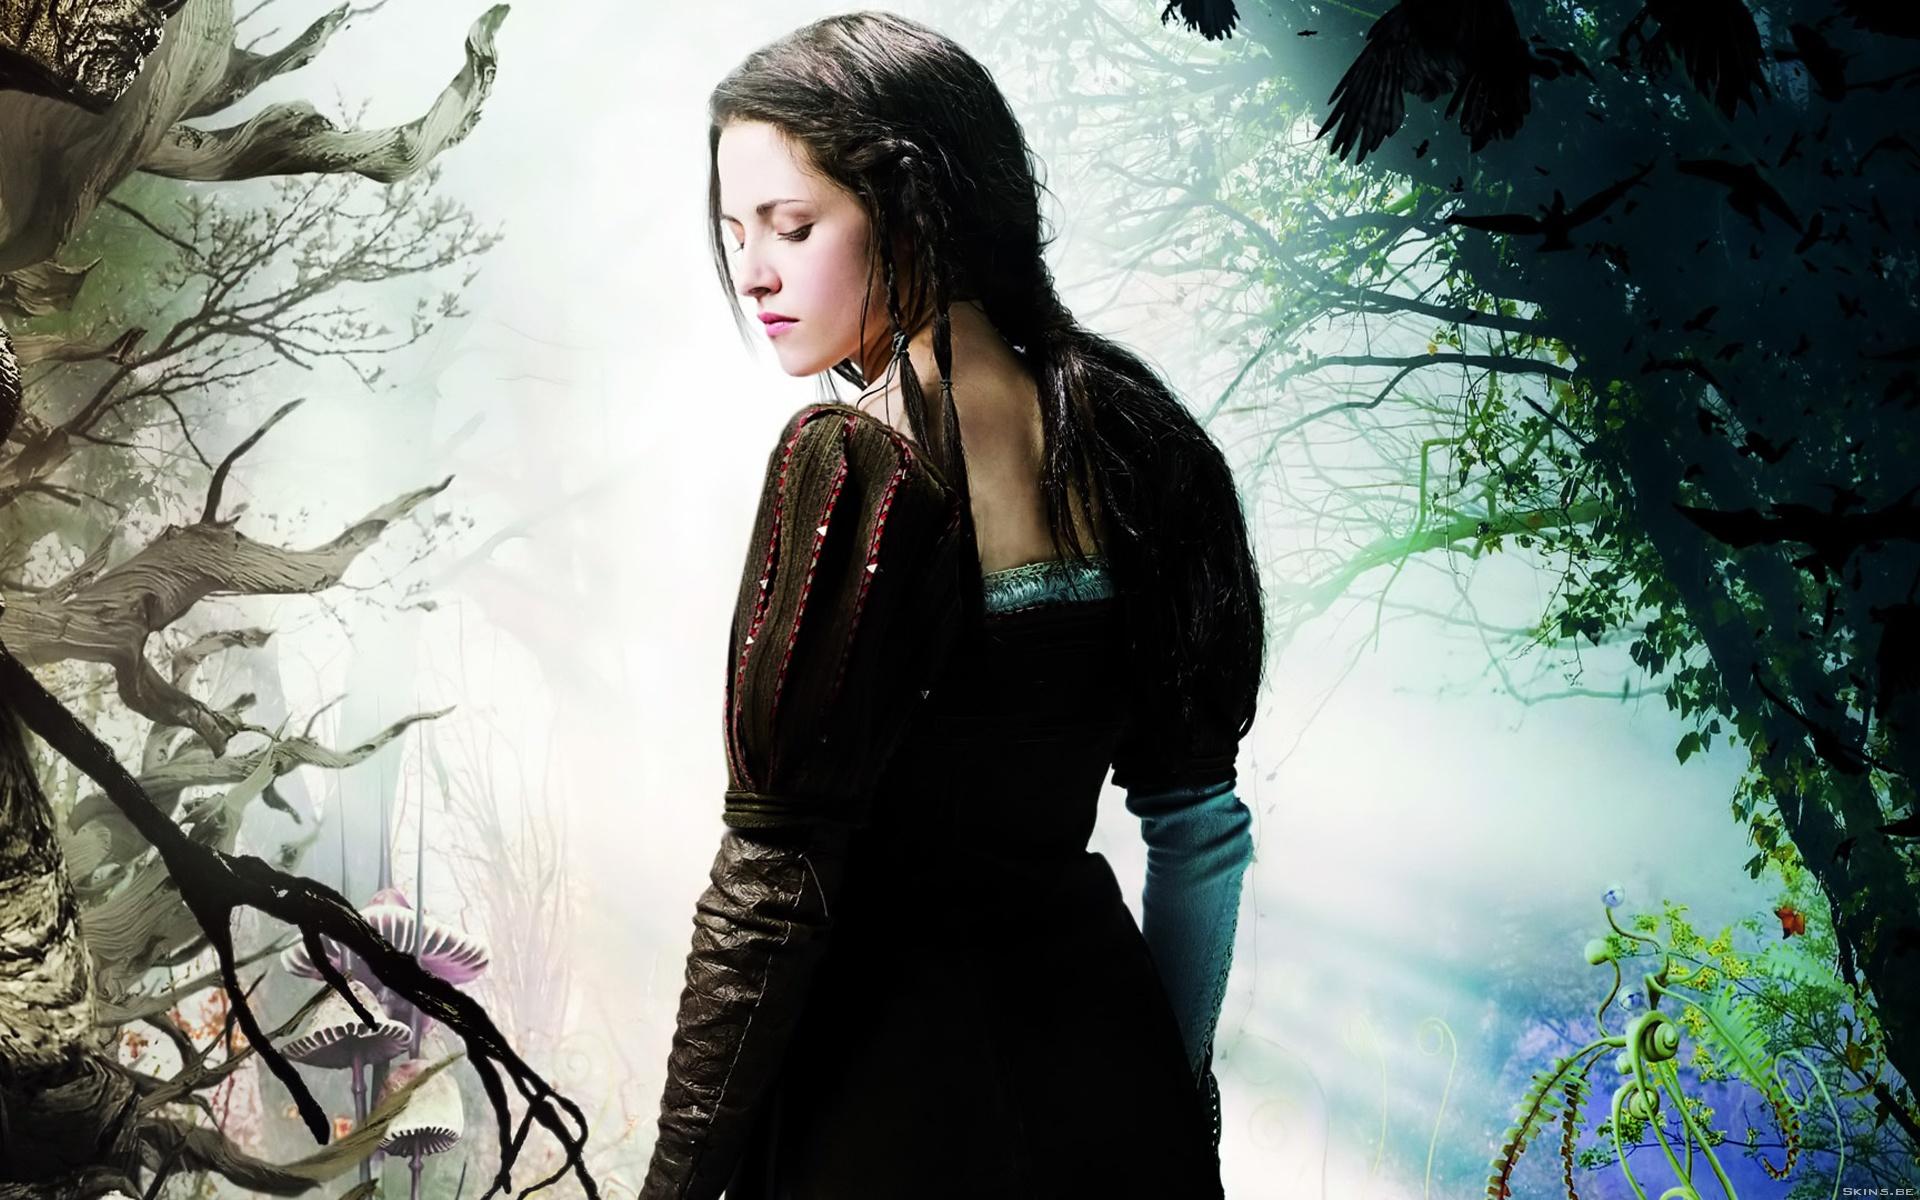 Kristen Stewart in Snow White and the Huntsman wallpaper